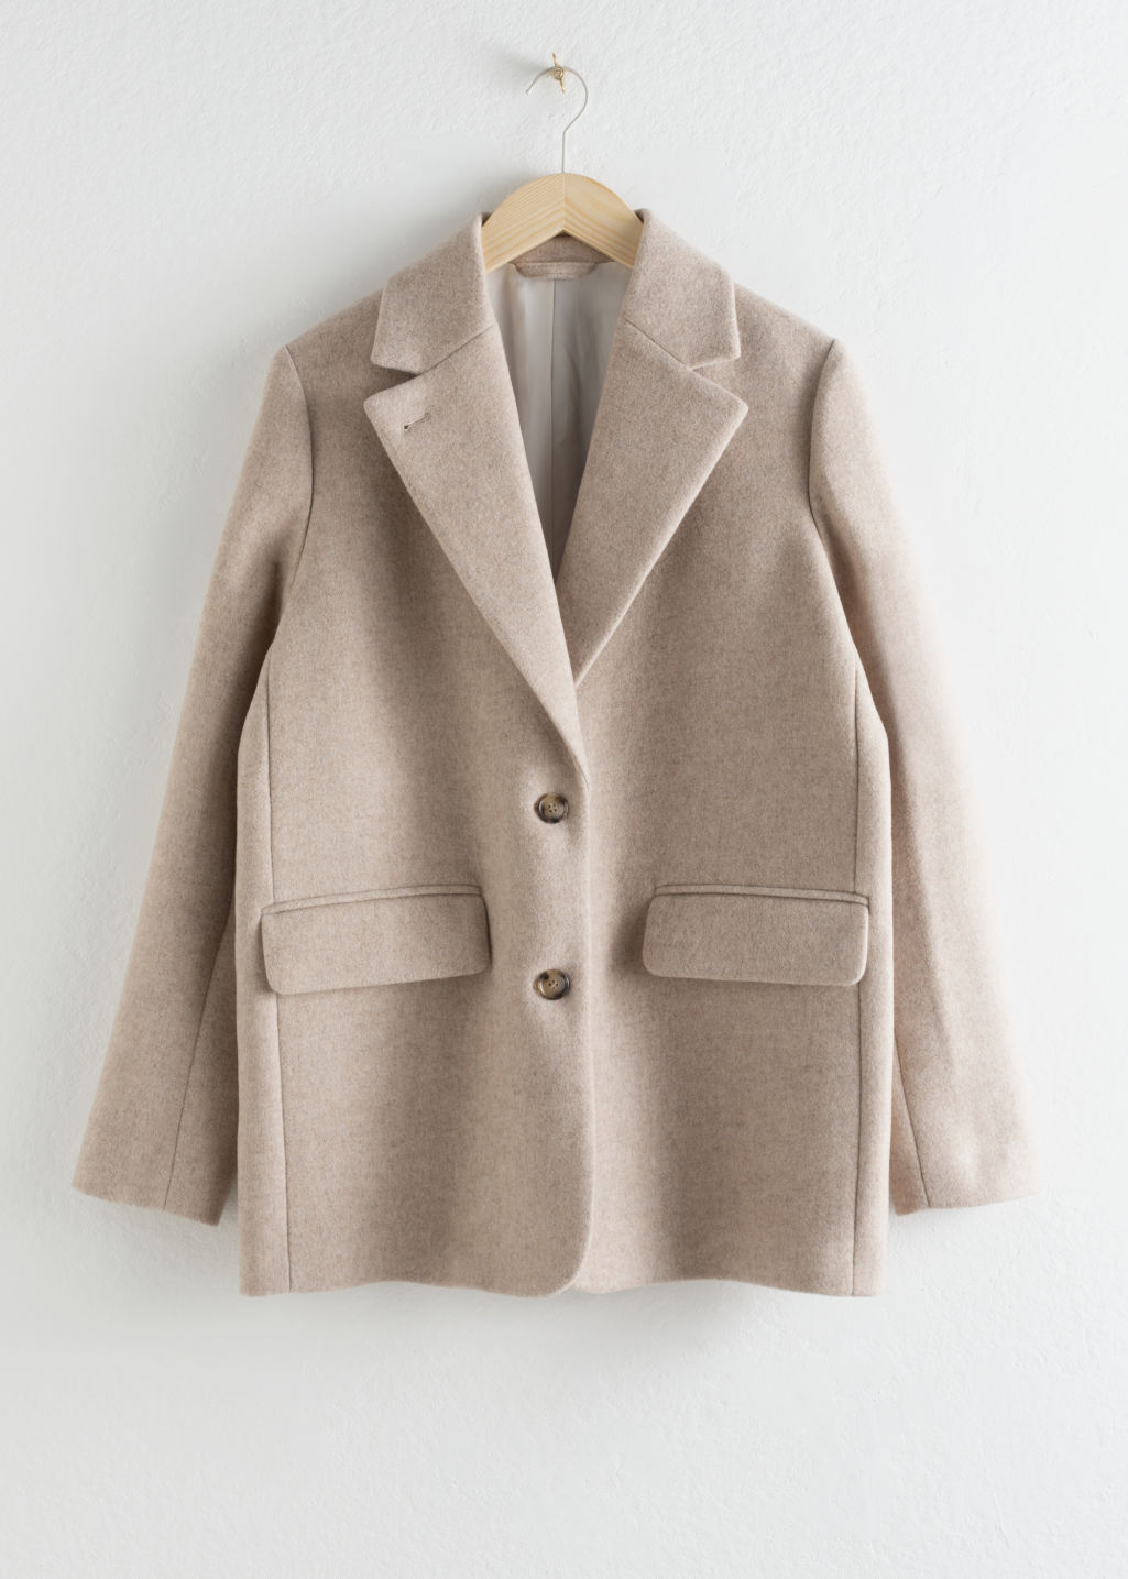 lowest price 2d4d3 a1989 Wool Blend Oversized Blazer - Light Beige - Blazers - & Other Stories